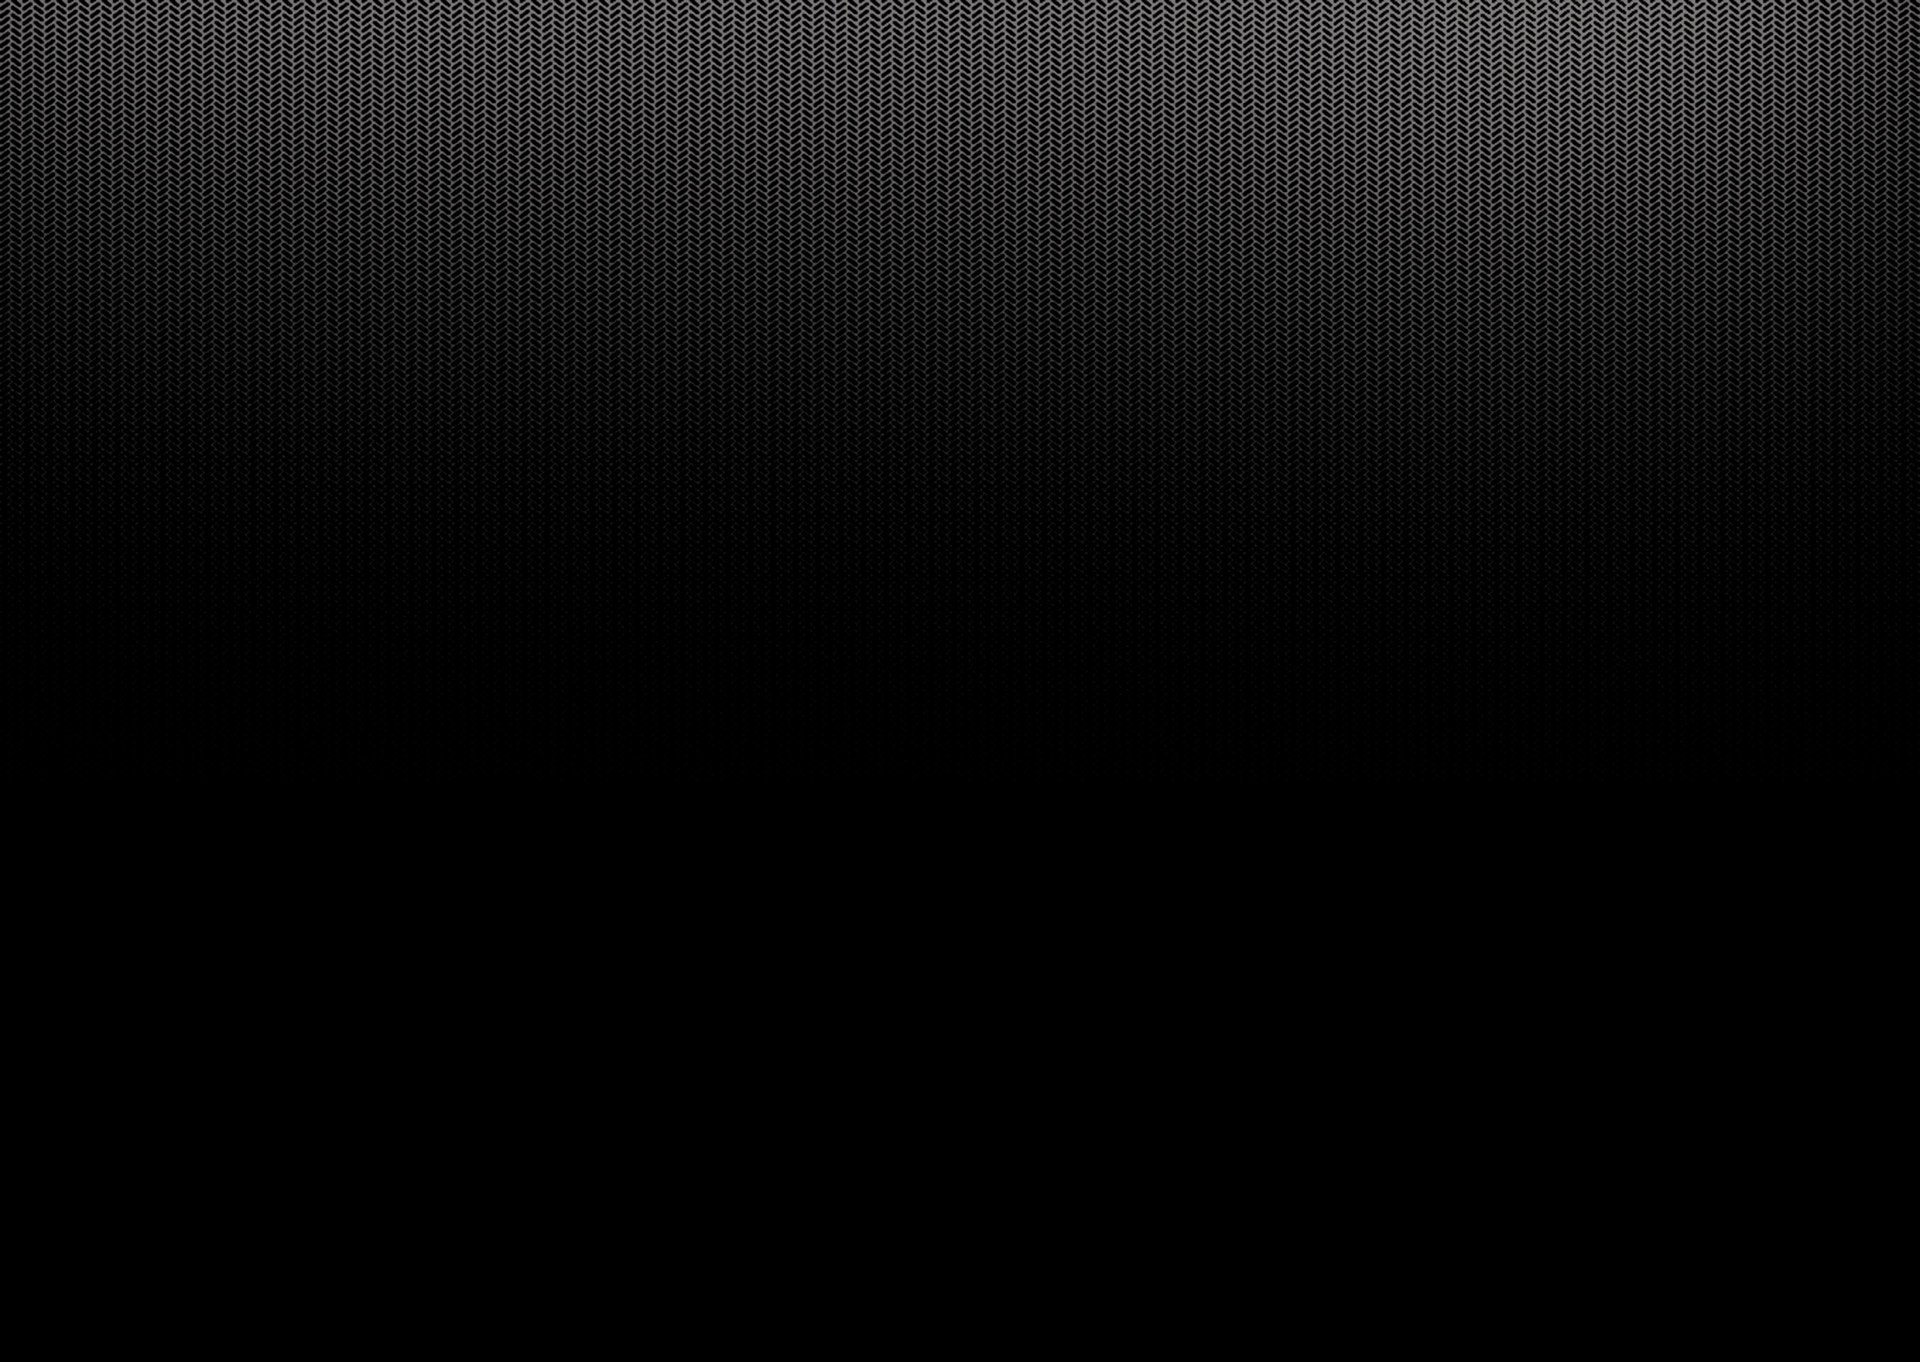 Black Cool Background - WallpaperSafari